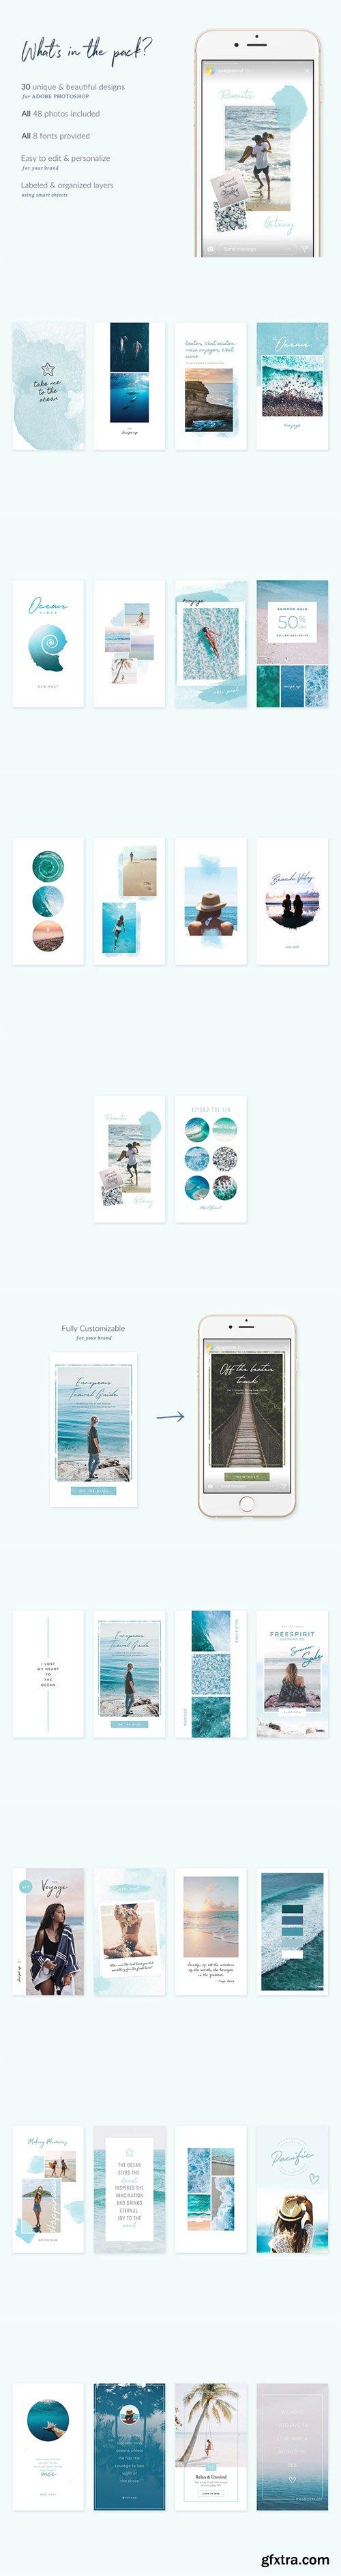 Oceans Instagram Stories - 30 Beautiful Instagram Story templates designed in Photoshop